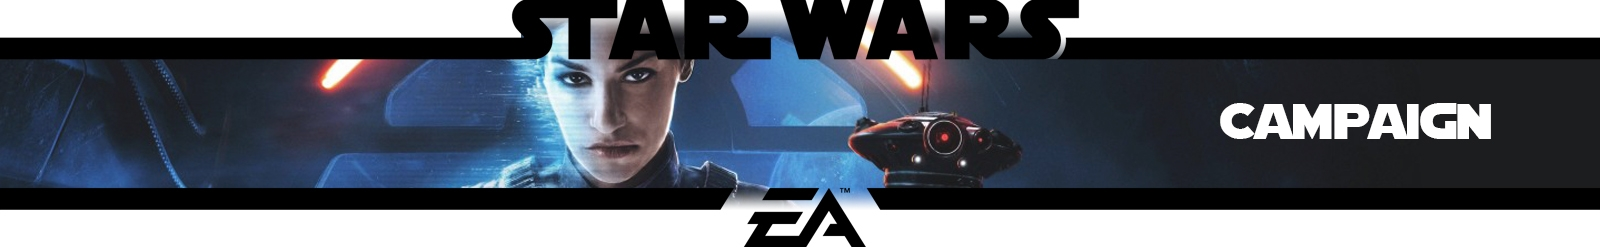 Star Wars Battlefront 2: Campaign